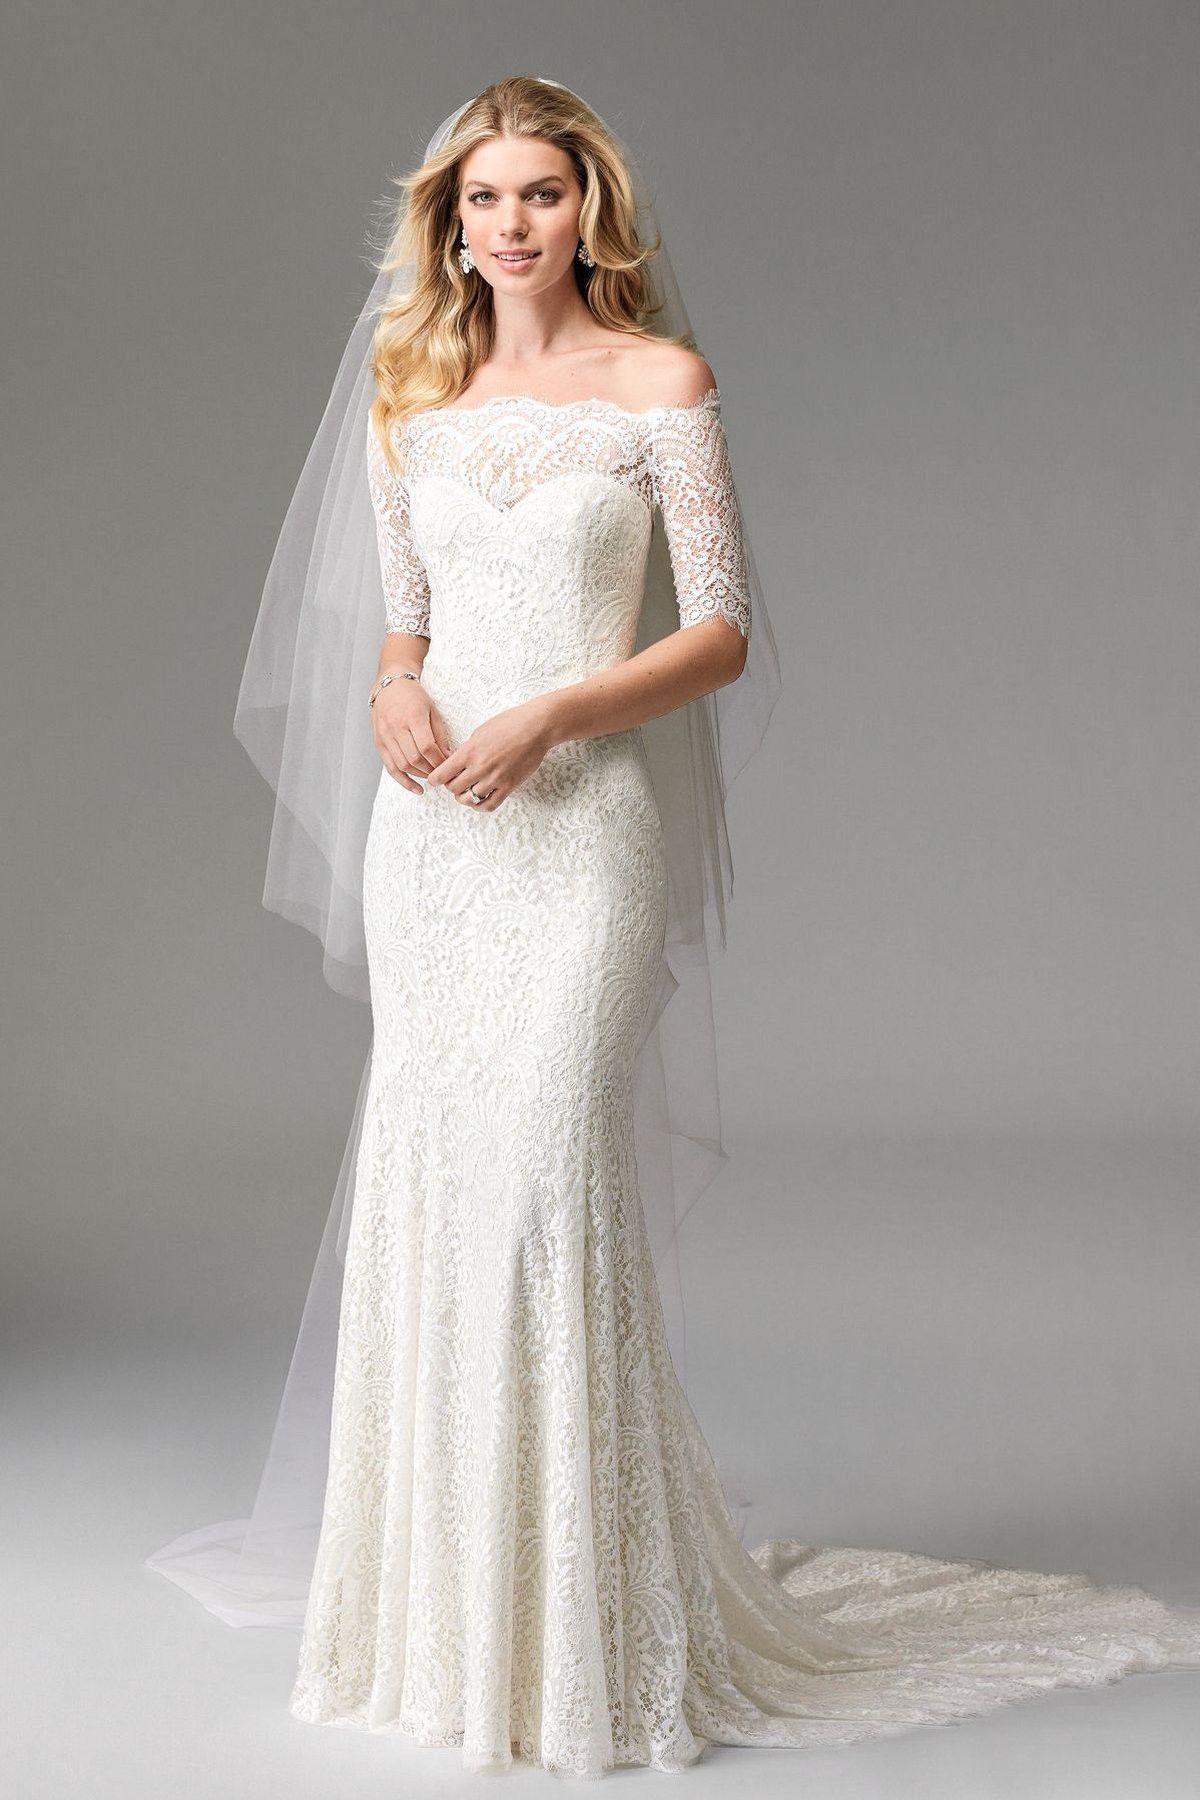 Wtoo By Watters Savannah 17110 Wedding Dress Off White By Bridal Expressions Kjole Bryllup Bryllupskjoler Kjole Med Blonder